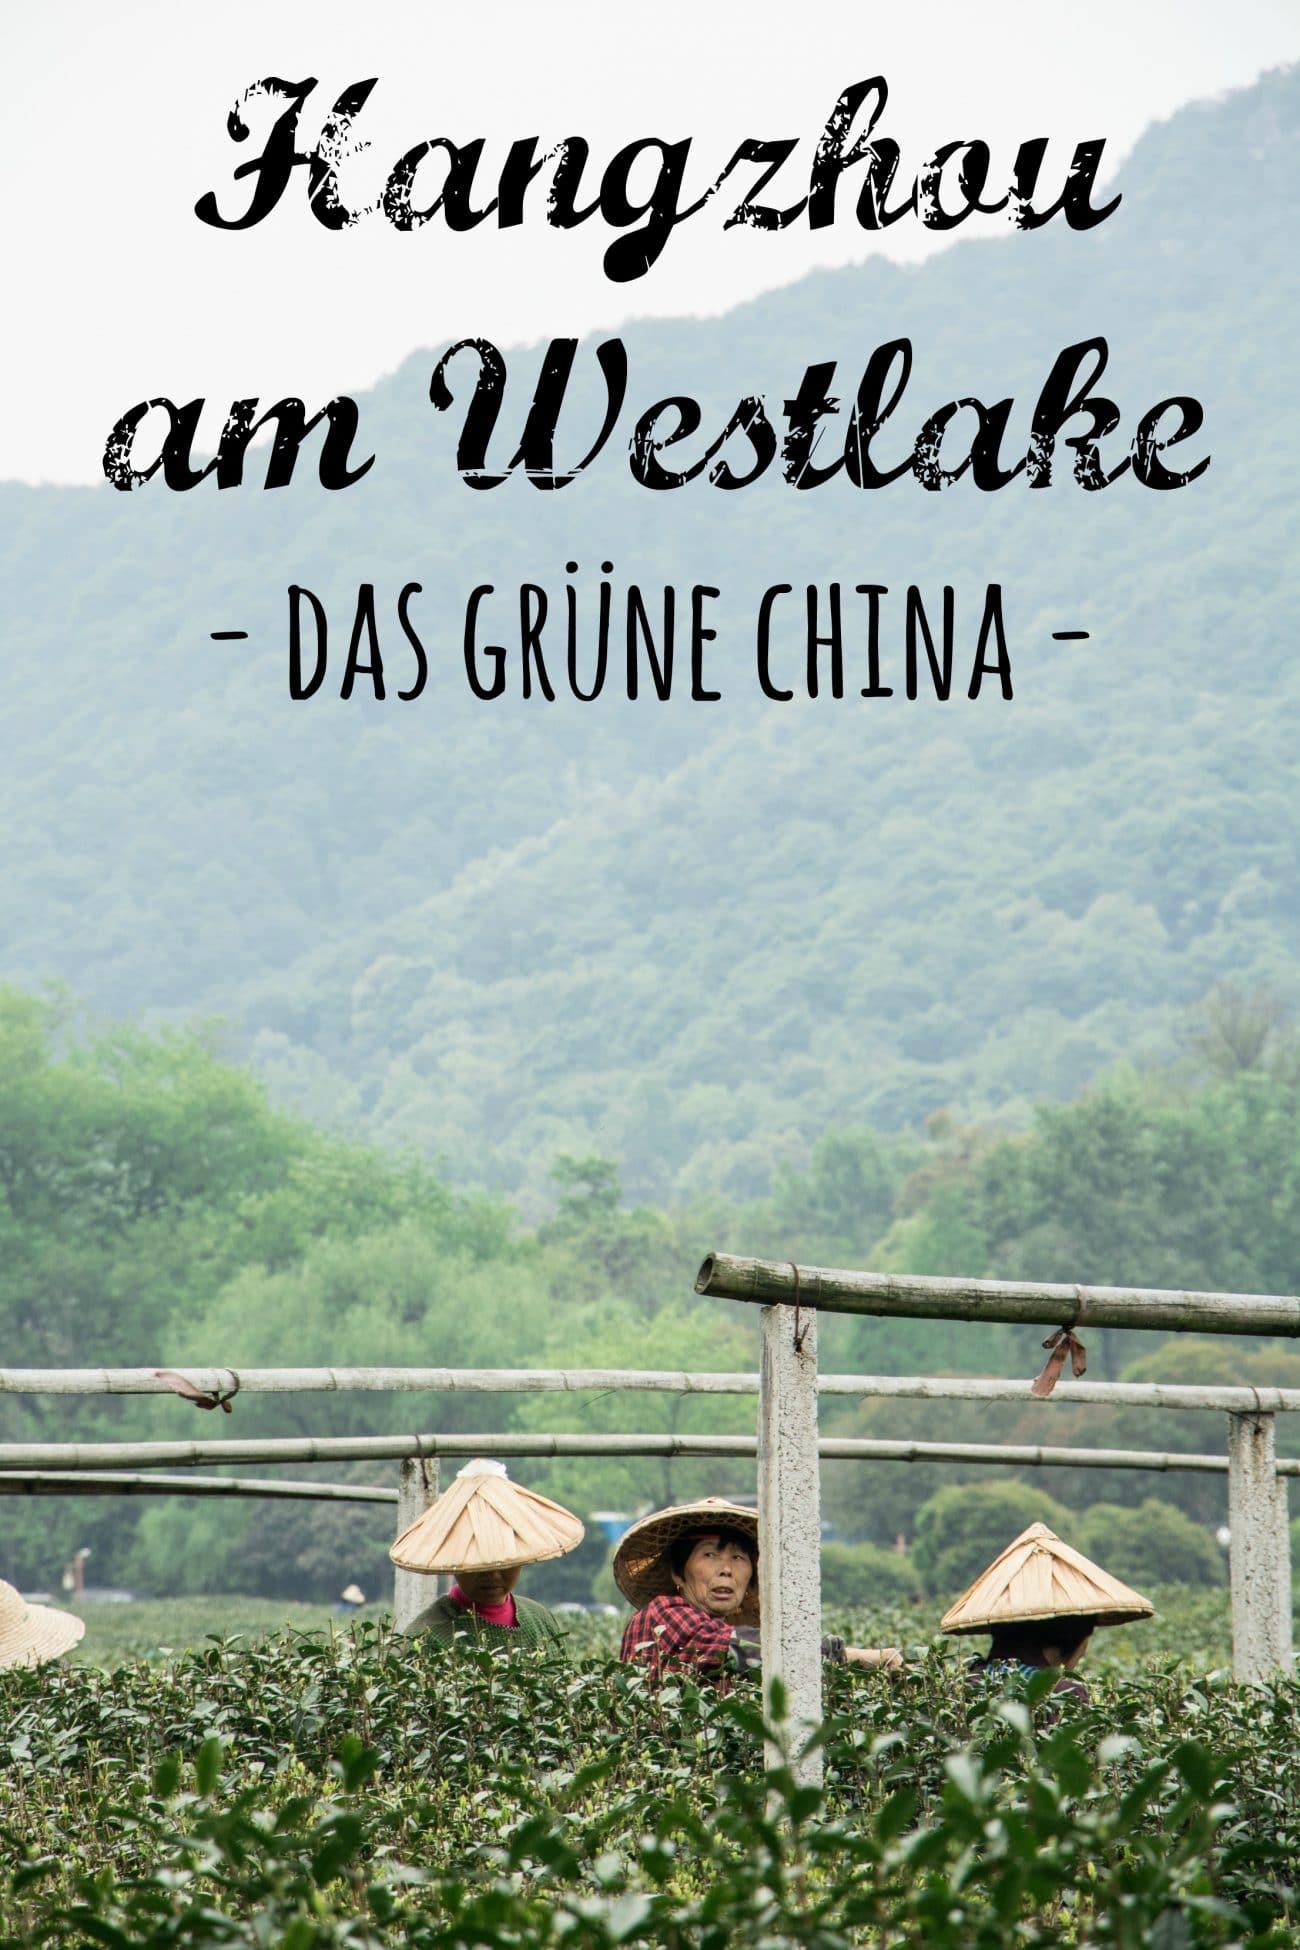 Hangzhou - drei Tage am Westlake